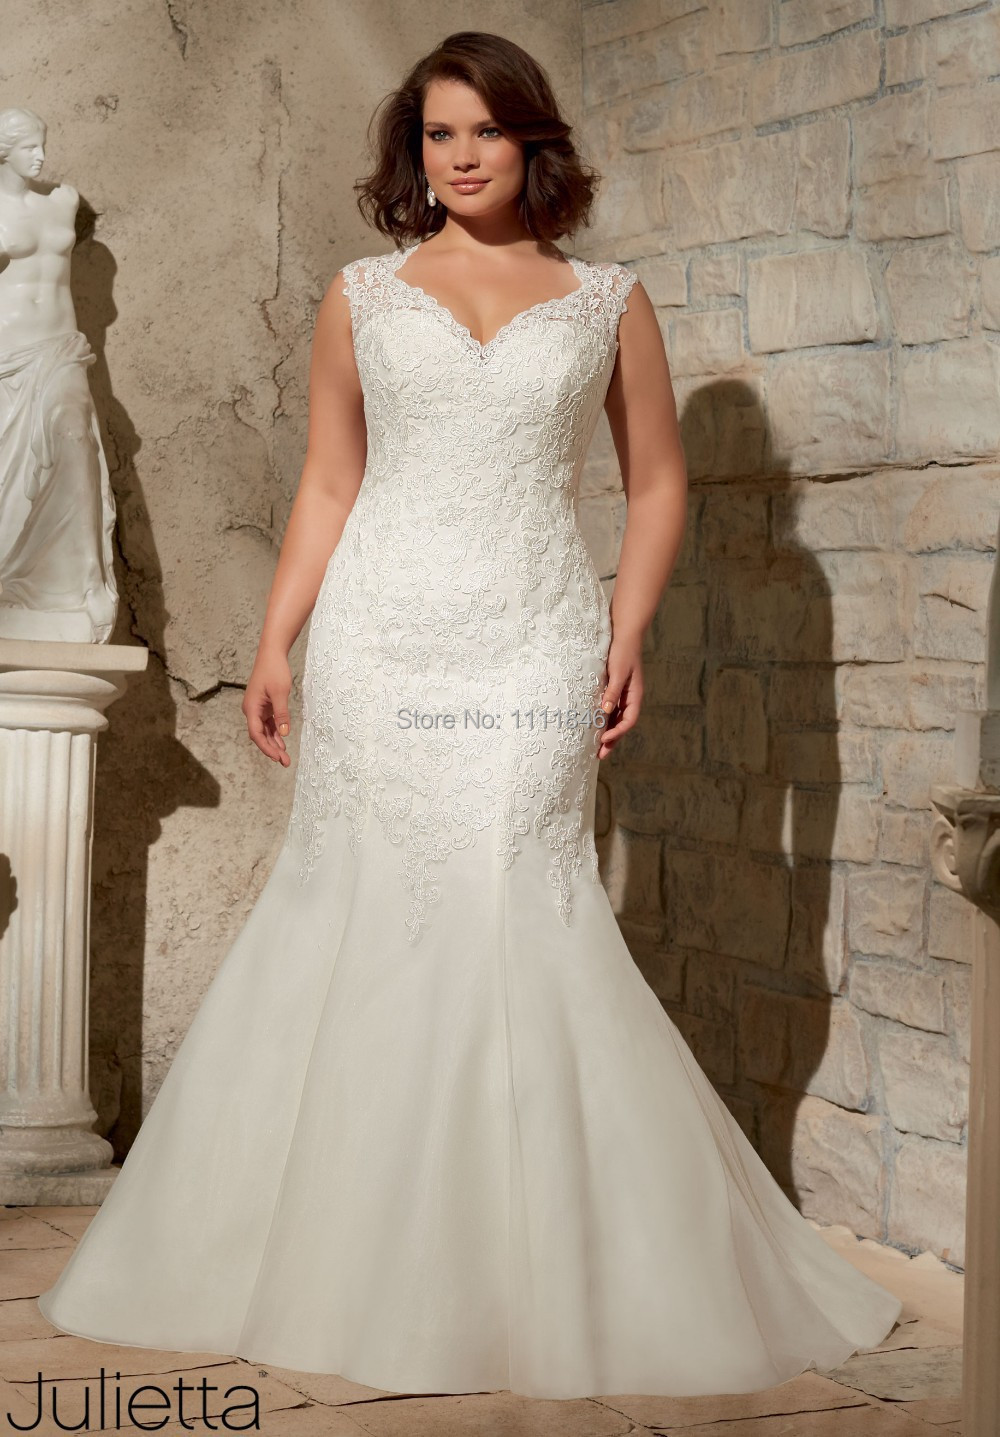 2015 vestido de noiva Plus Size Mermaid Wedding Gown Lace ...